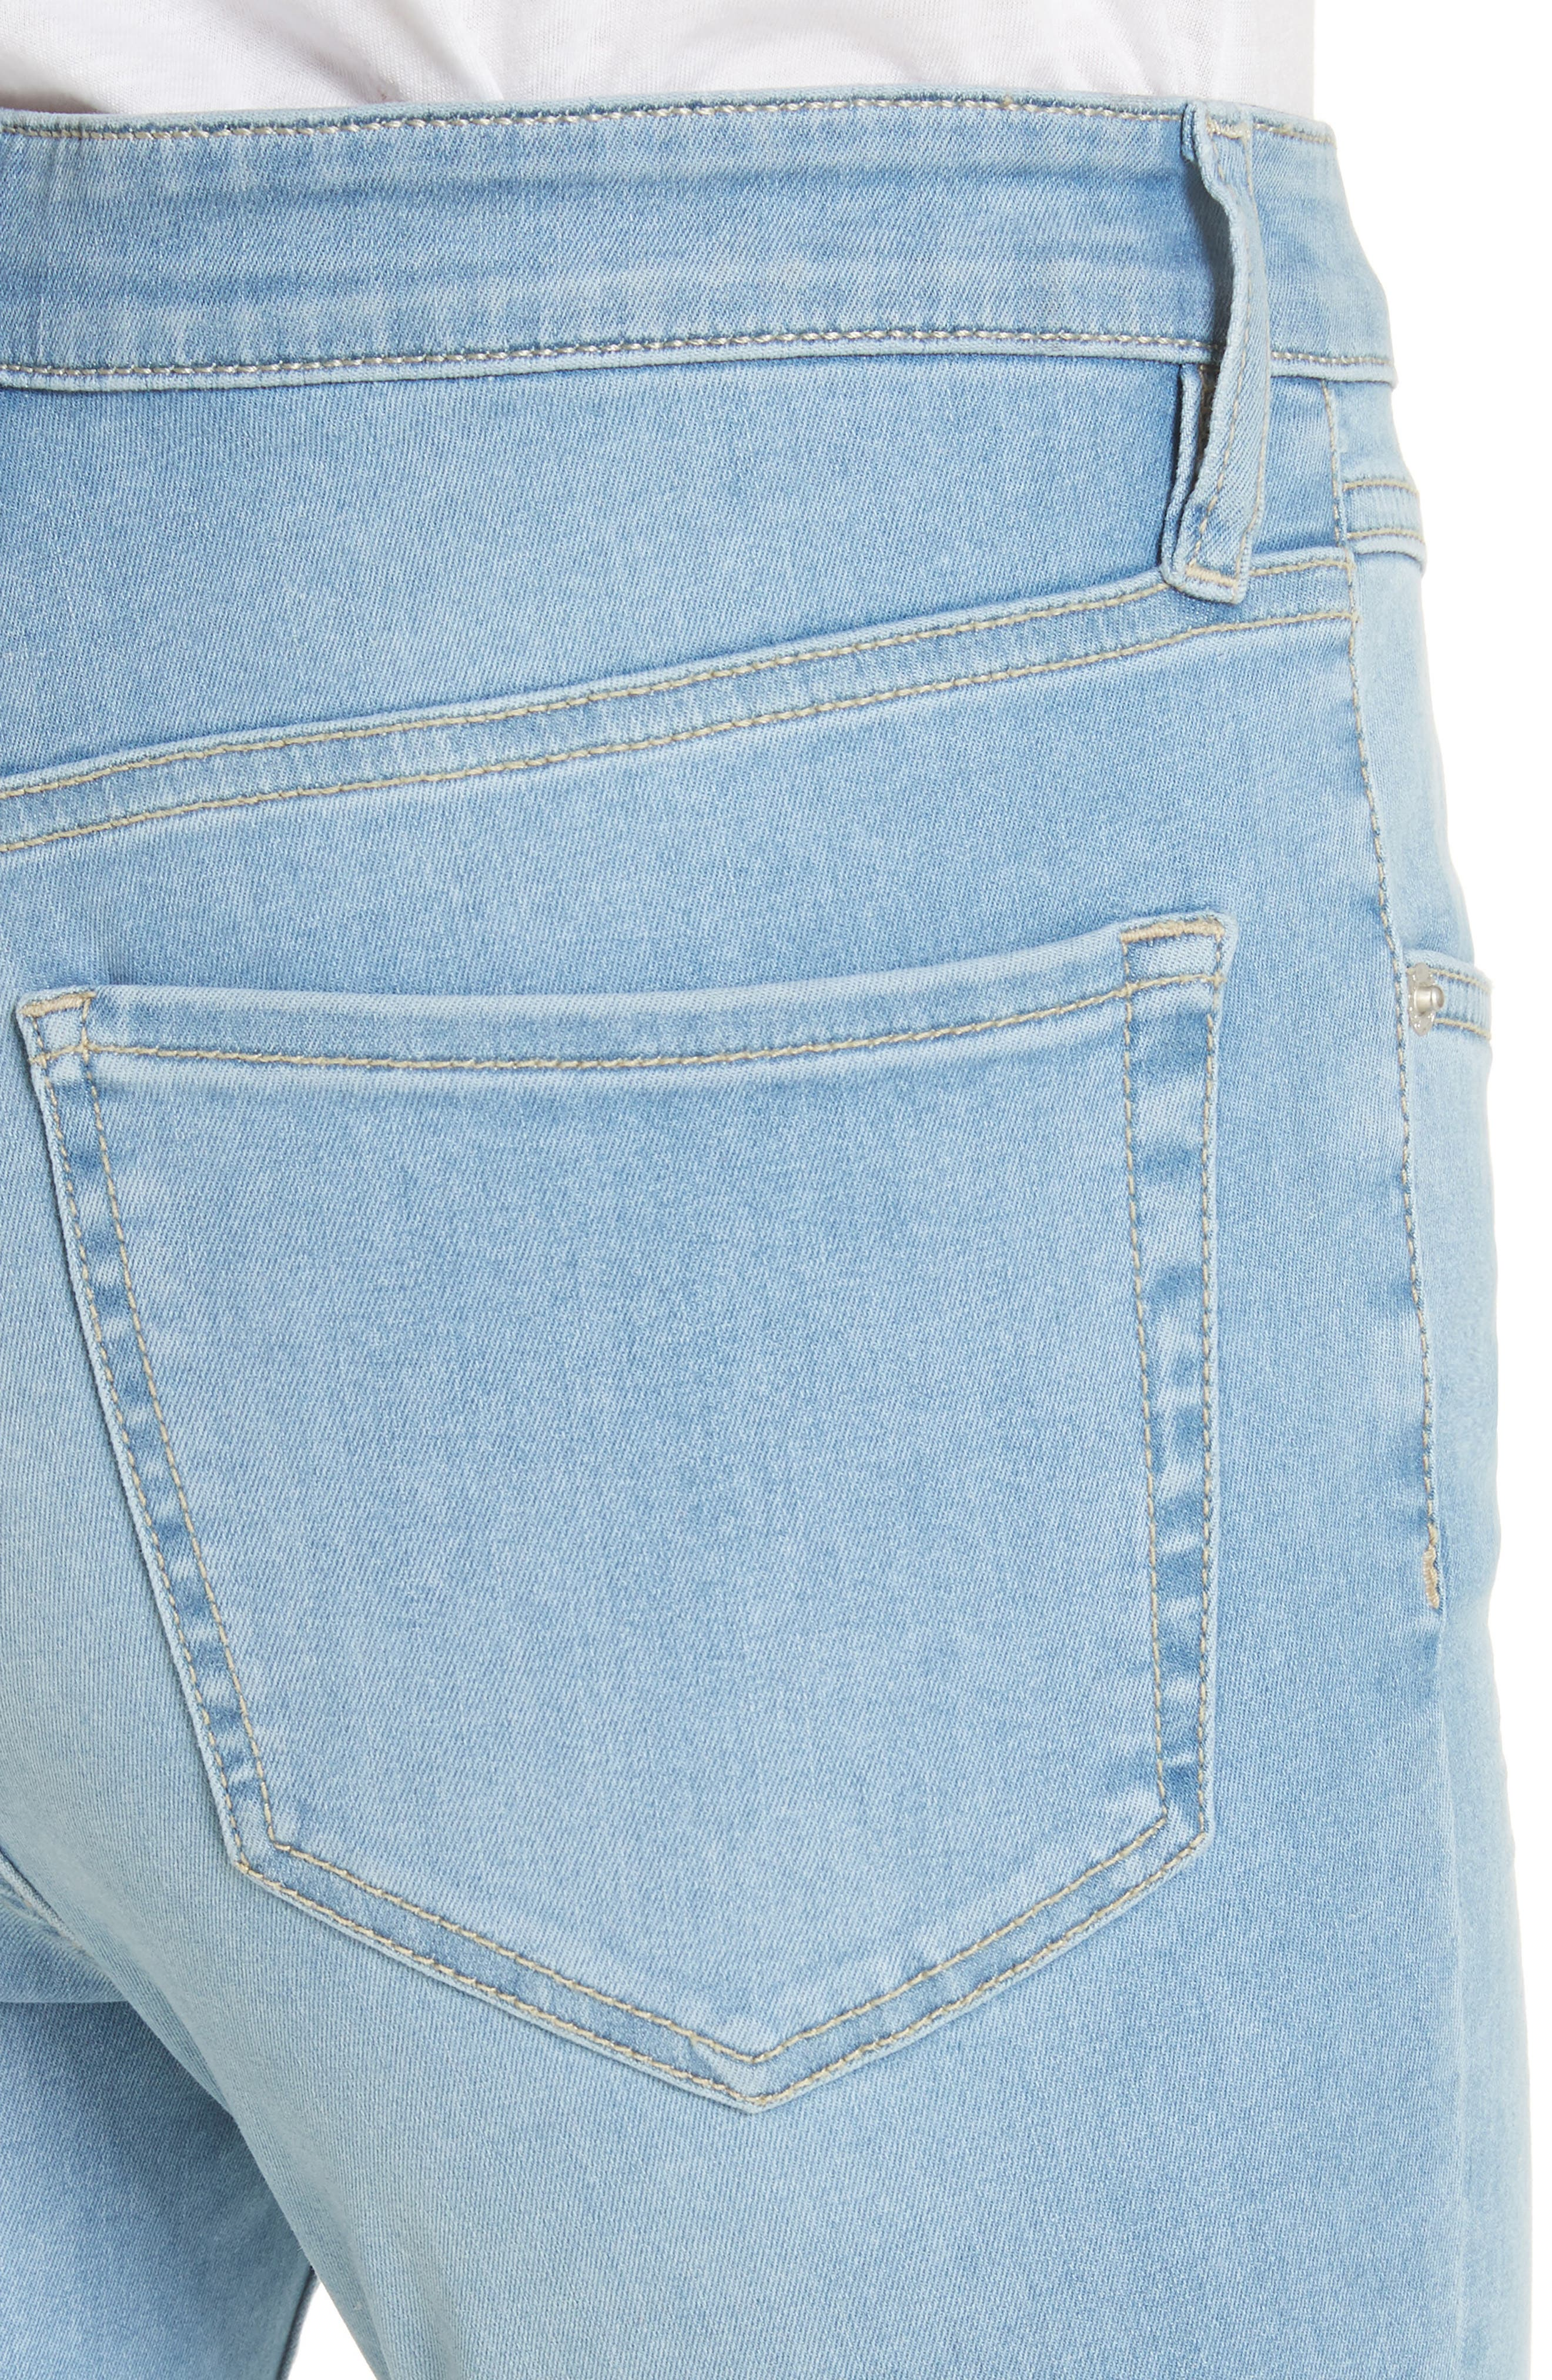 Mara Skinny Jeans,                             Alternate thumbnail 4, color,                             400